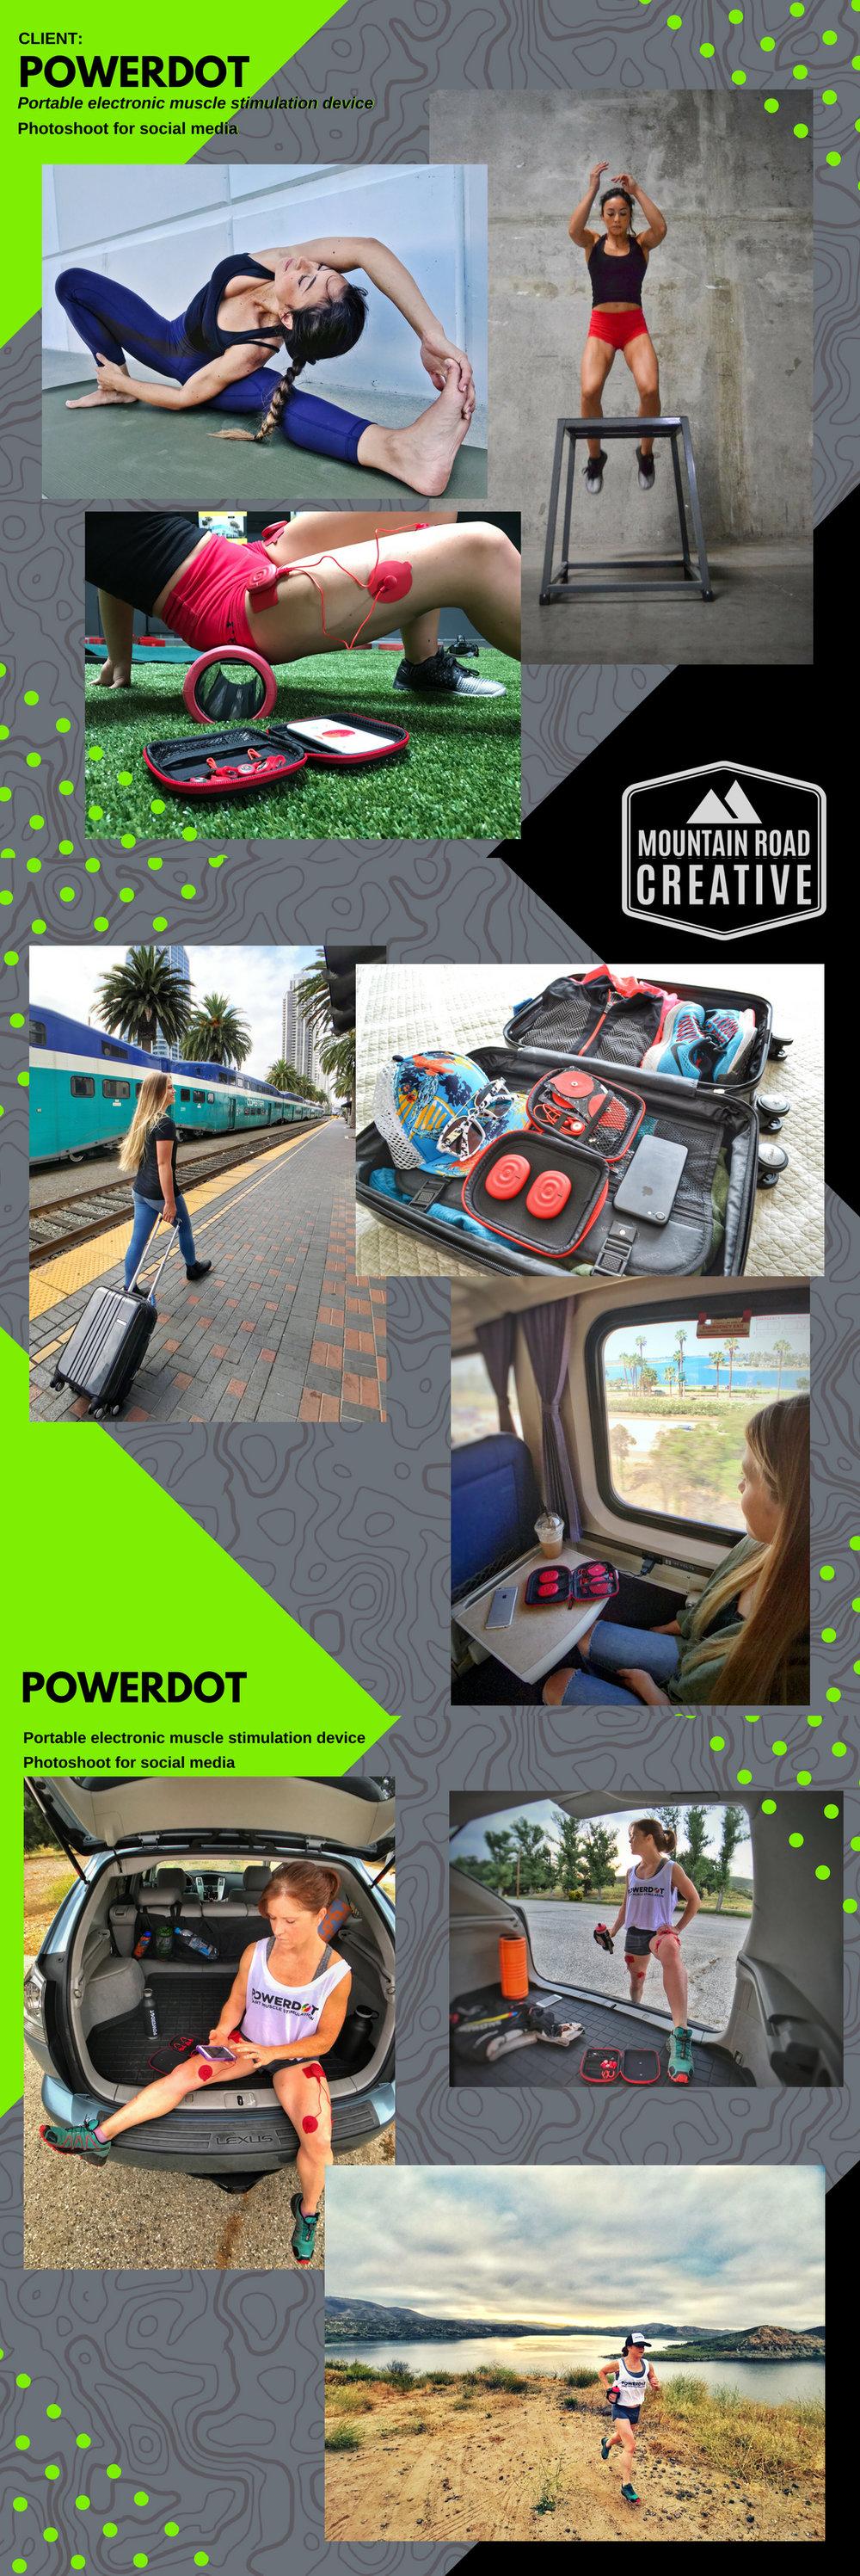 PowerDot Portfolio image.jpg